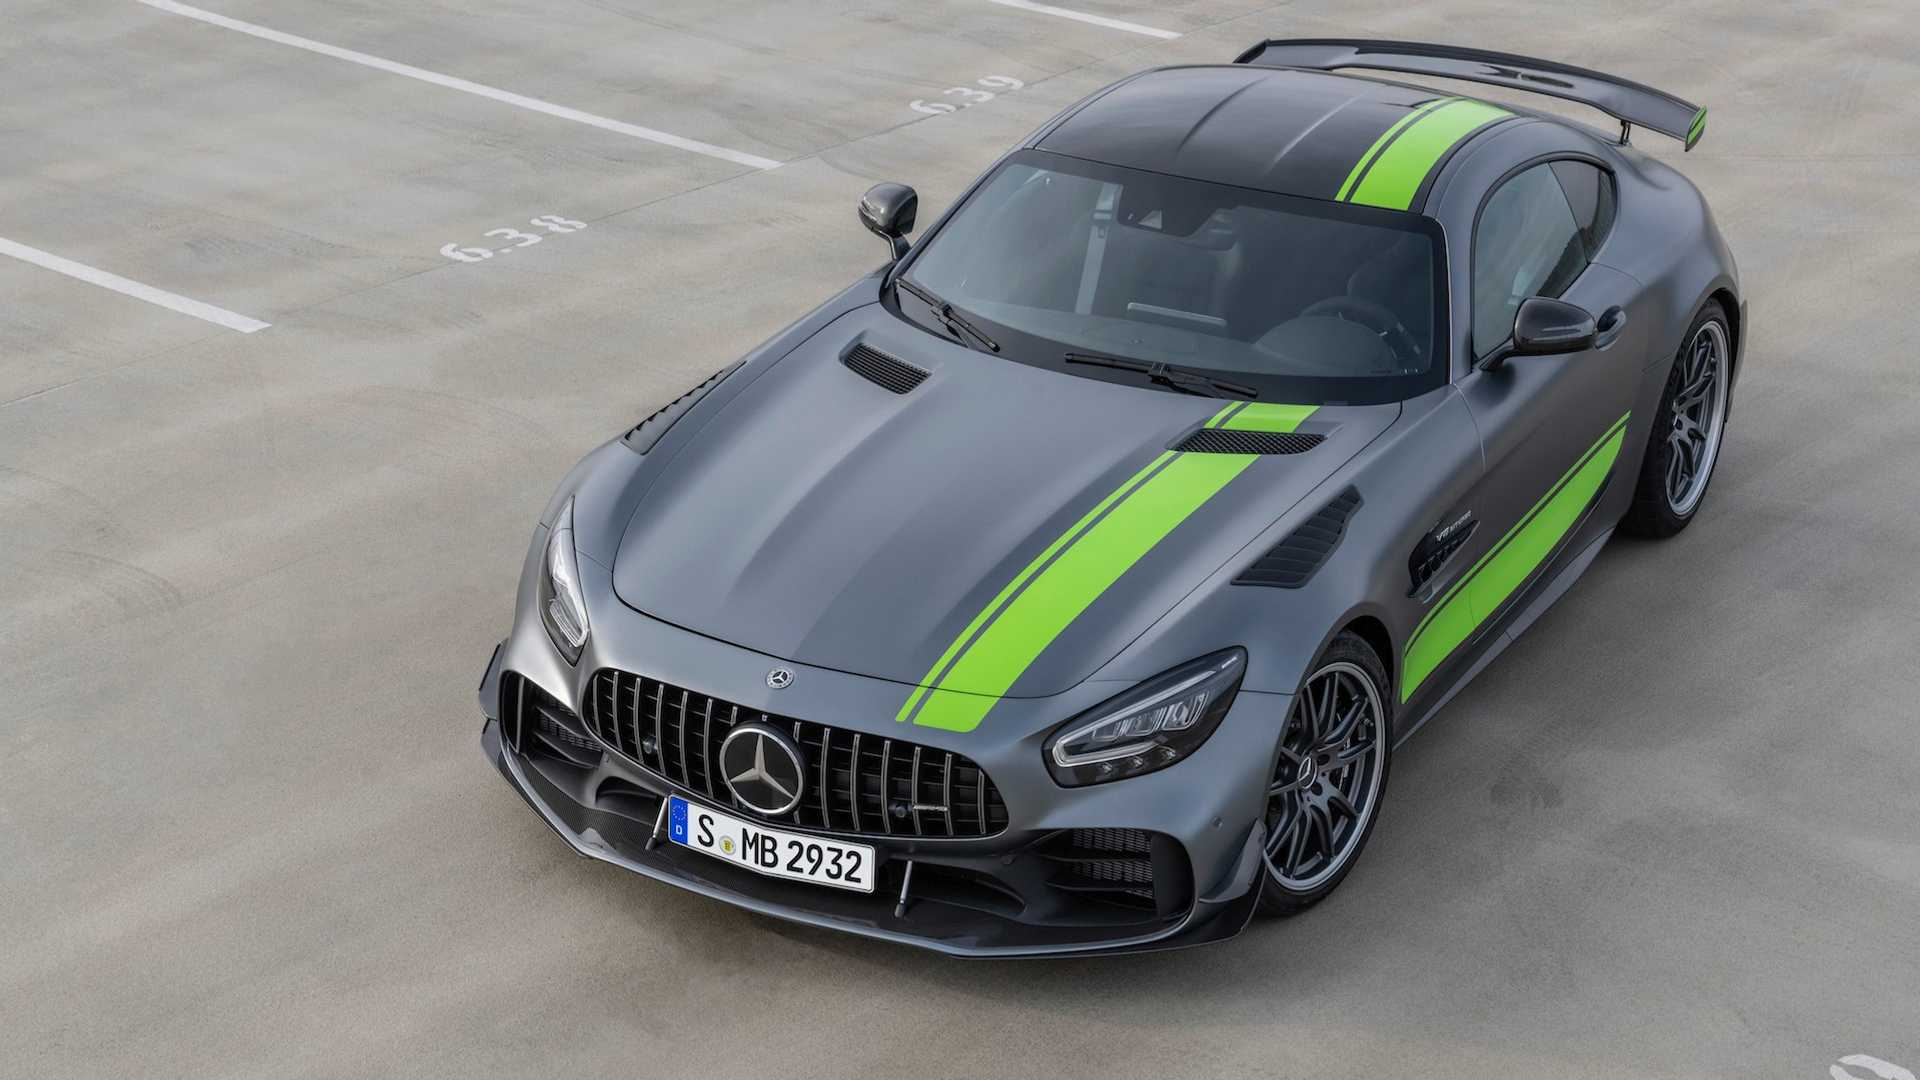 Mercedes-AMG GT 2019, restyling con sorpresa incluida